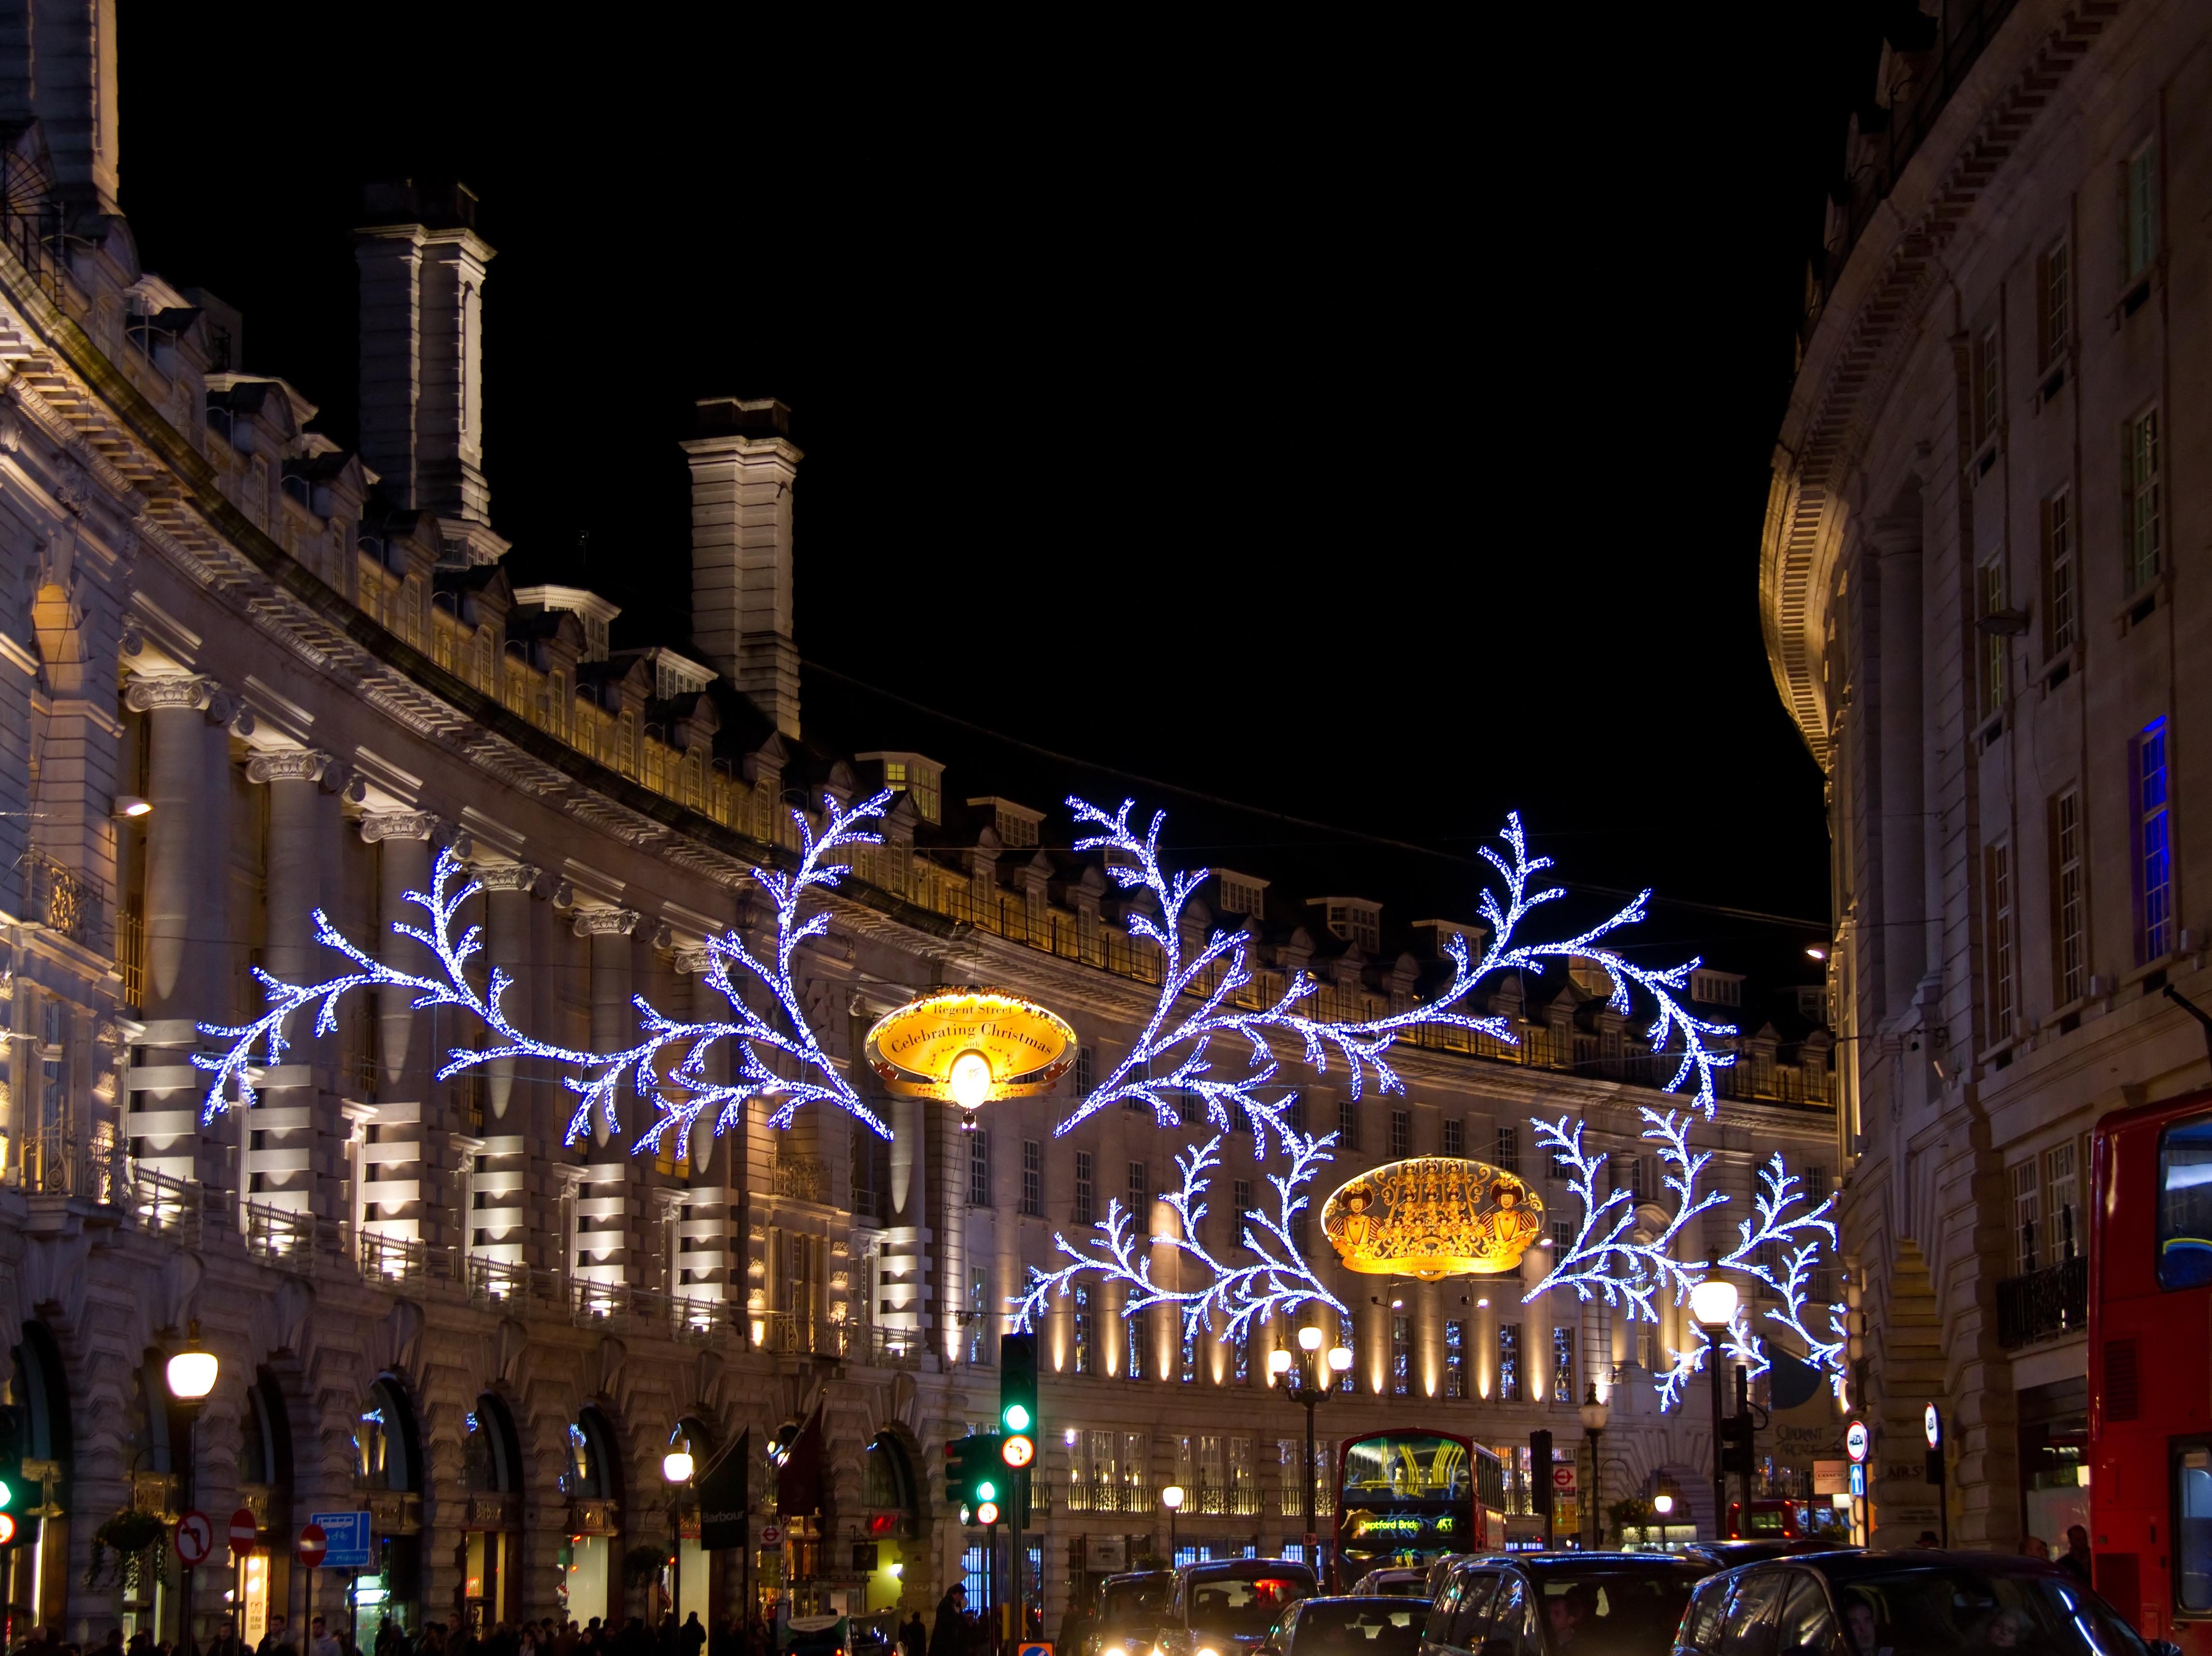 File:Regent Street Christmas Lights (8280914699) (2).jpg - Wikimedia ...